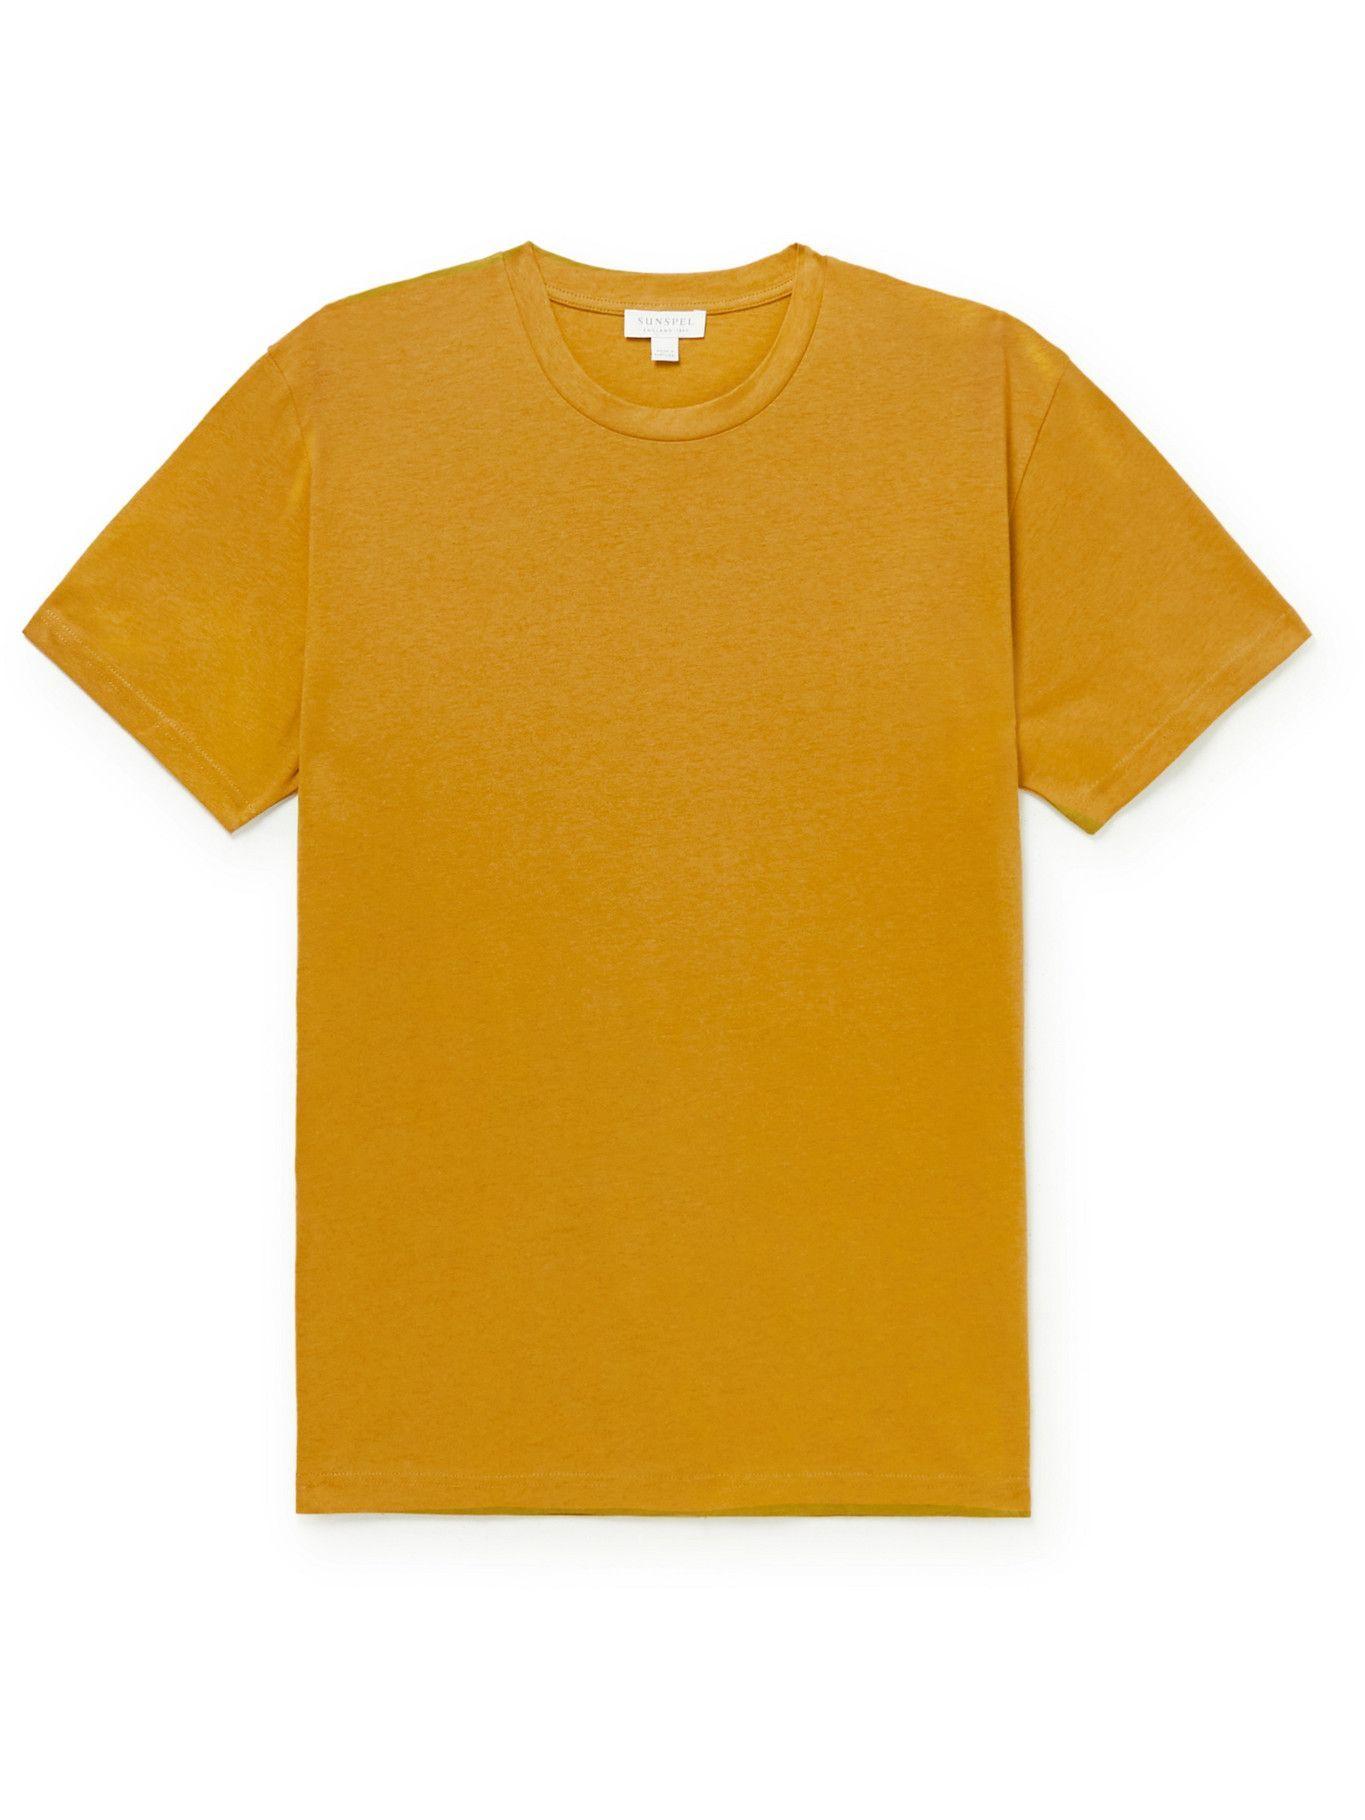 SUNSPEL - Riviera Cotton-Jersey T-Shirt - Yellow